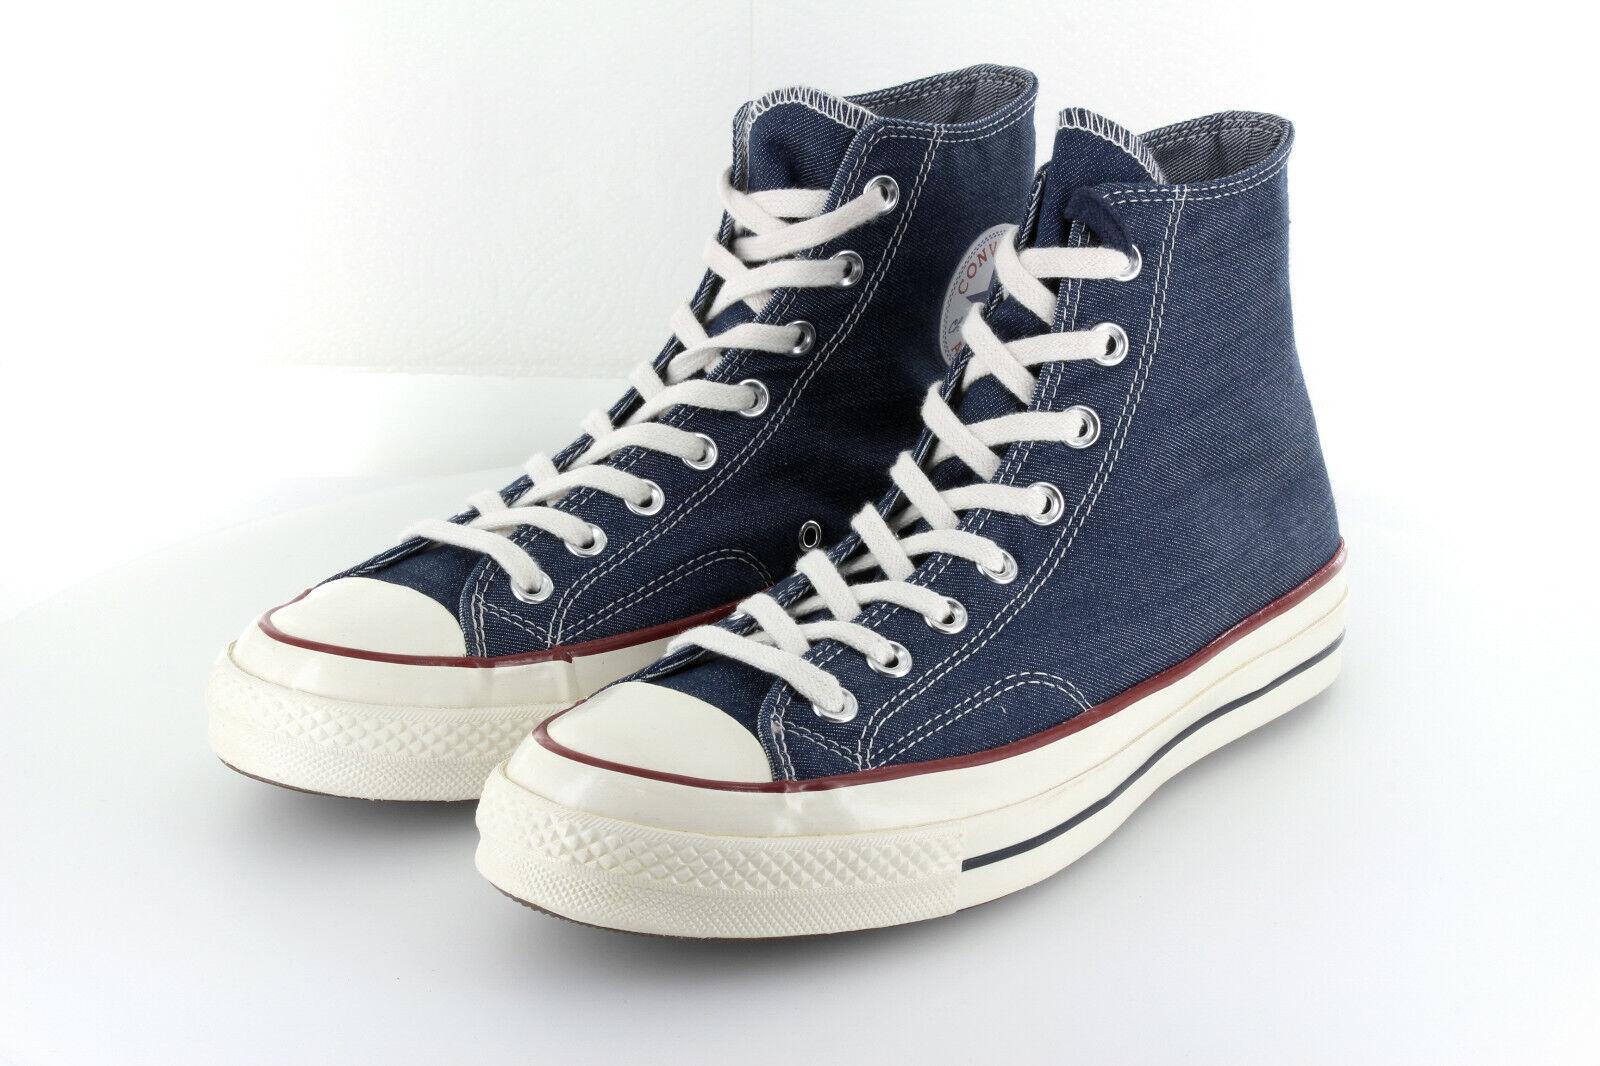 Converse Chuck Taylor AS Hi 70s bluee Denim Limited Edition  42,5   43,5 US9